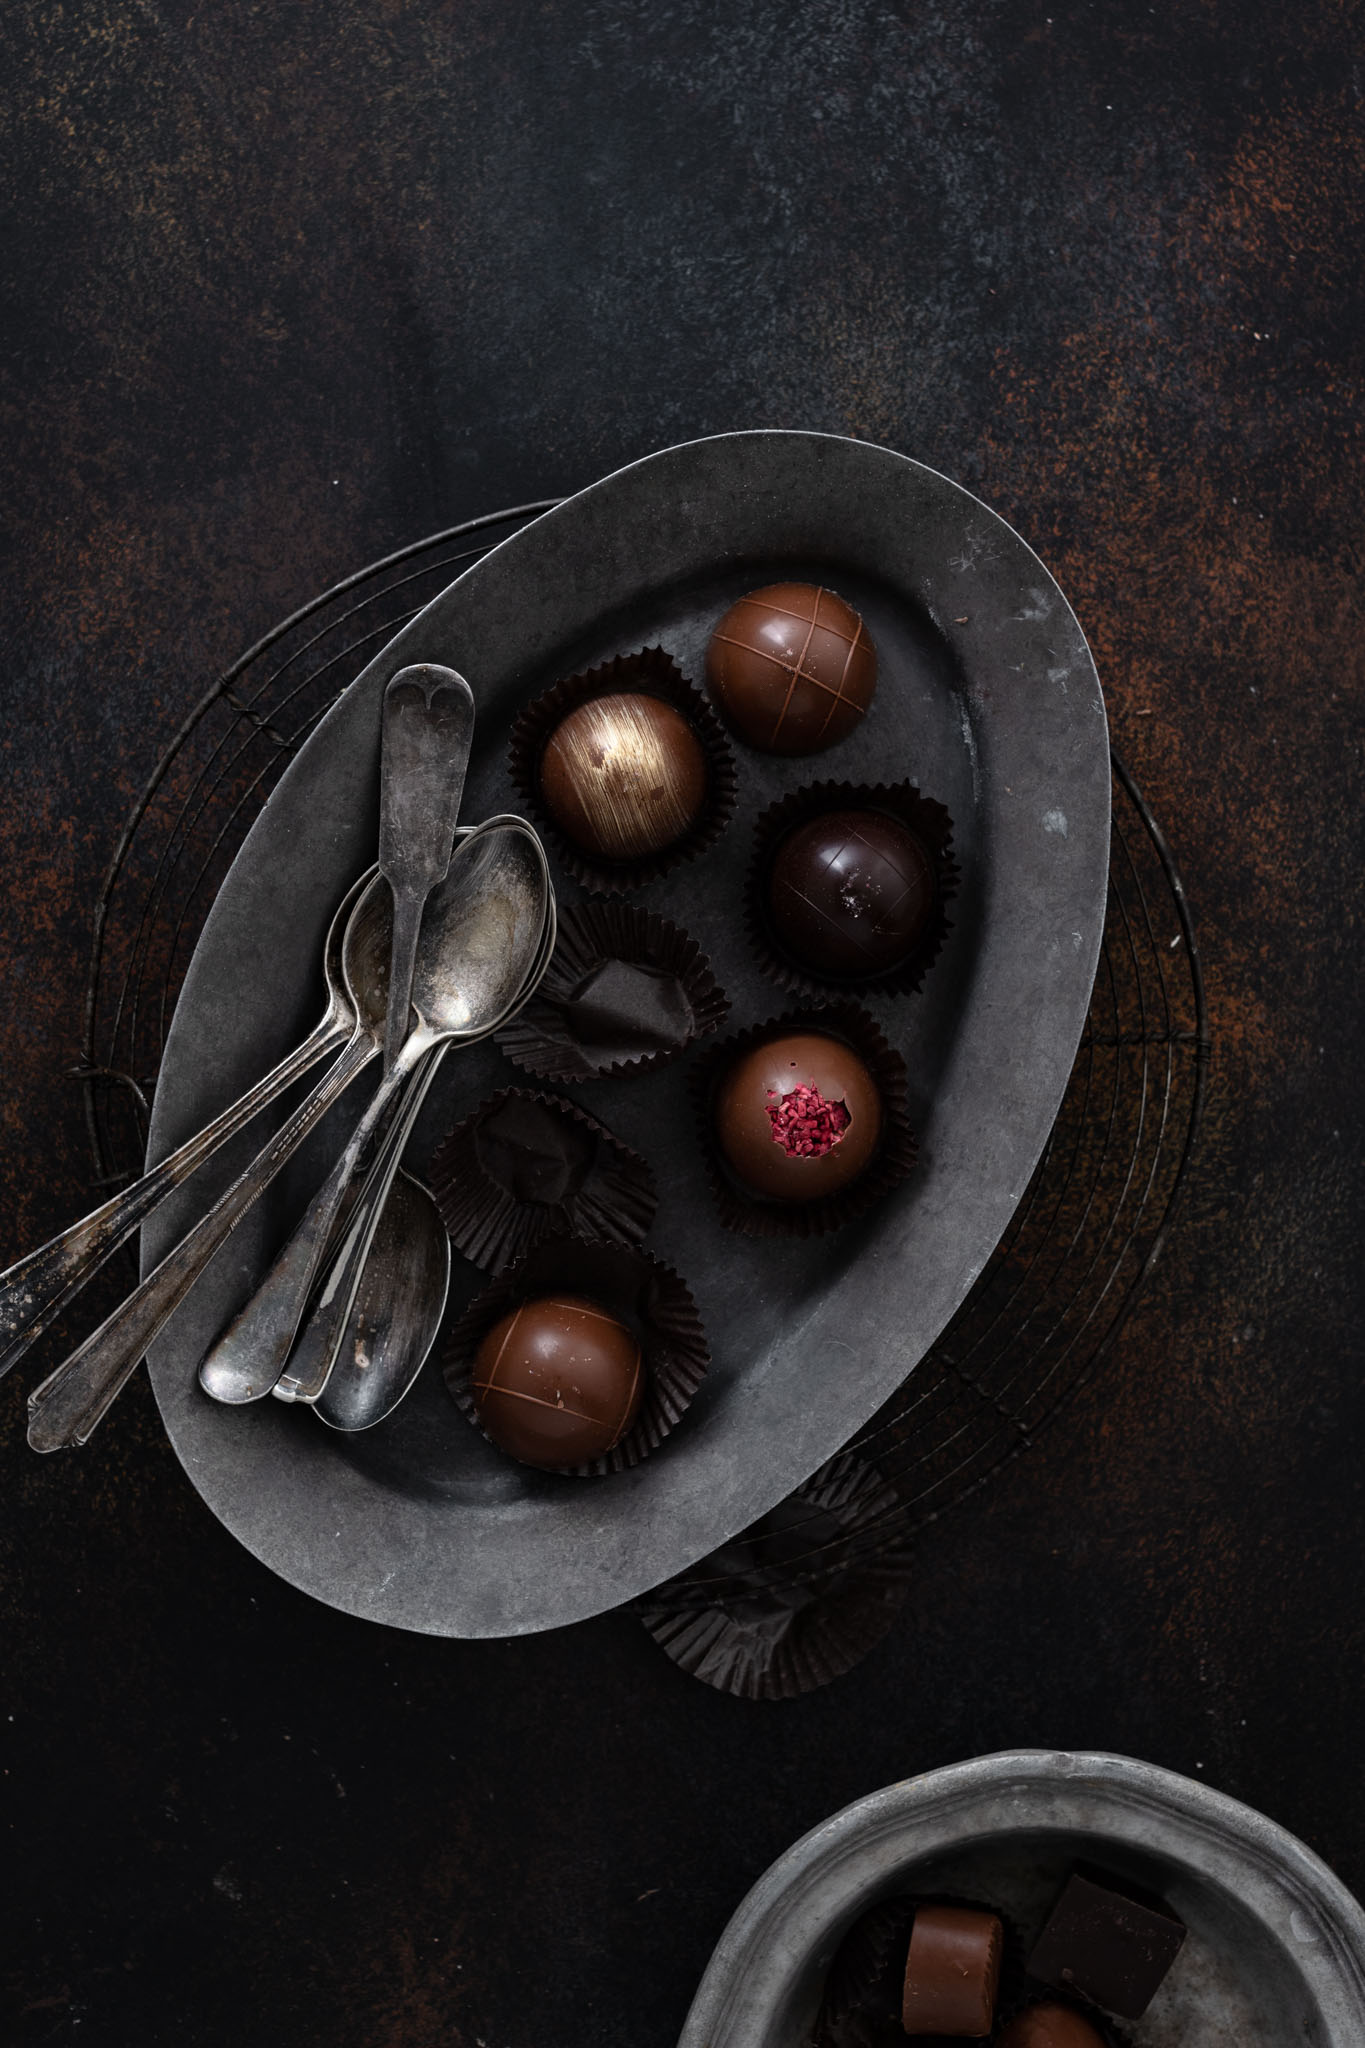 Simply Chocolate's Chocolate Truffles on a plate.